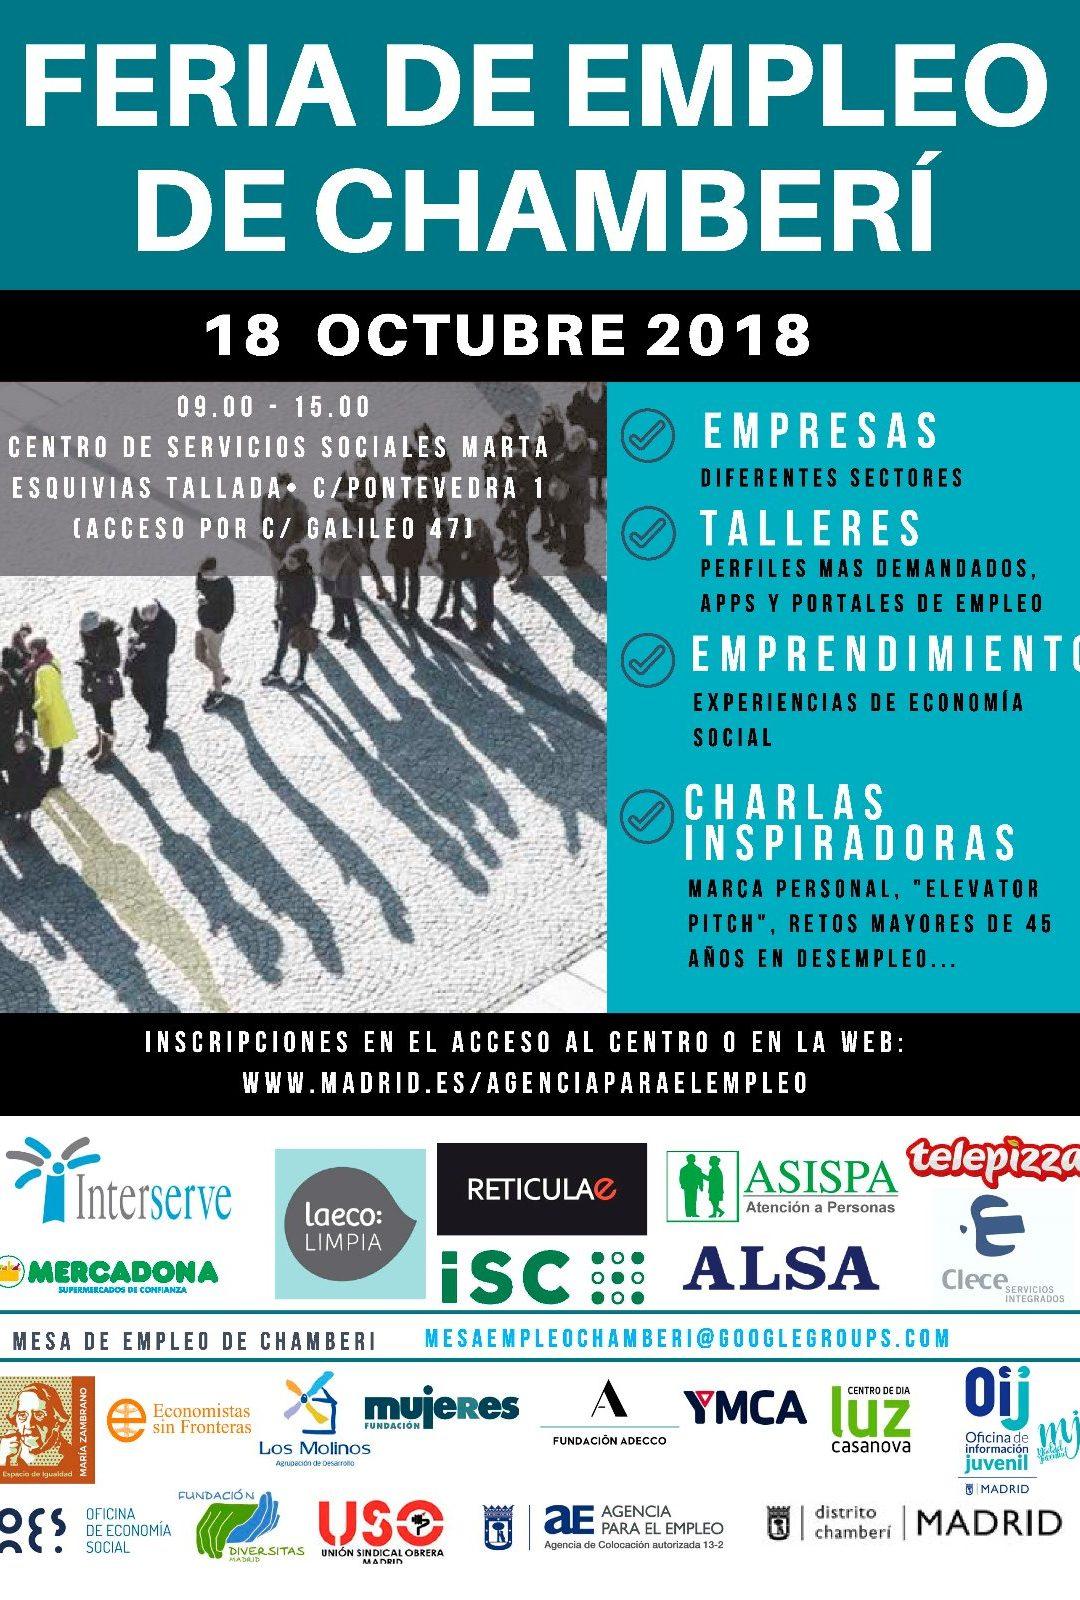 USO-Madrid participa en la I Feria de Empleo de Chamberí del próximo jueves, 18 de octubre